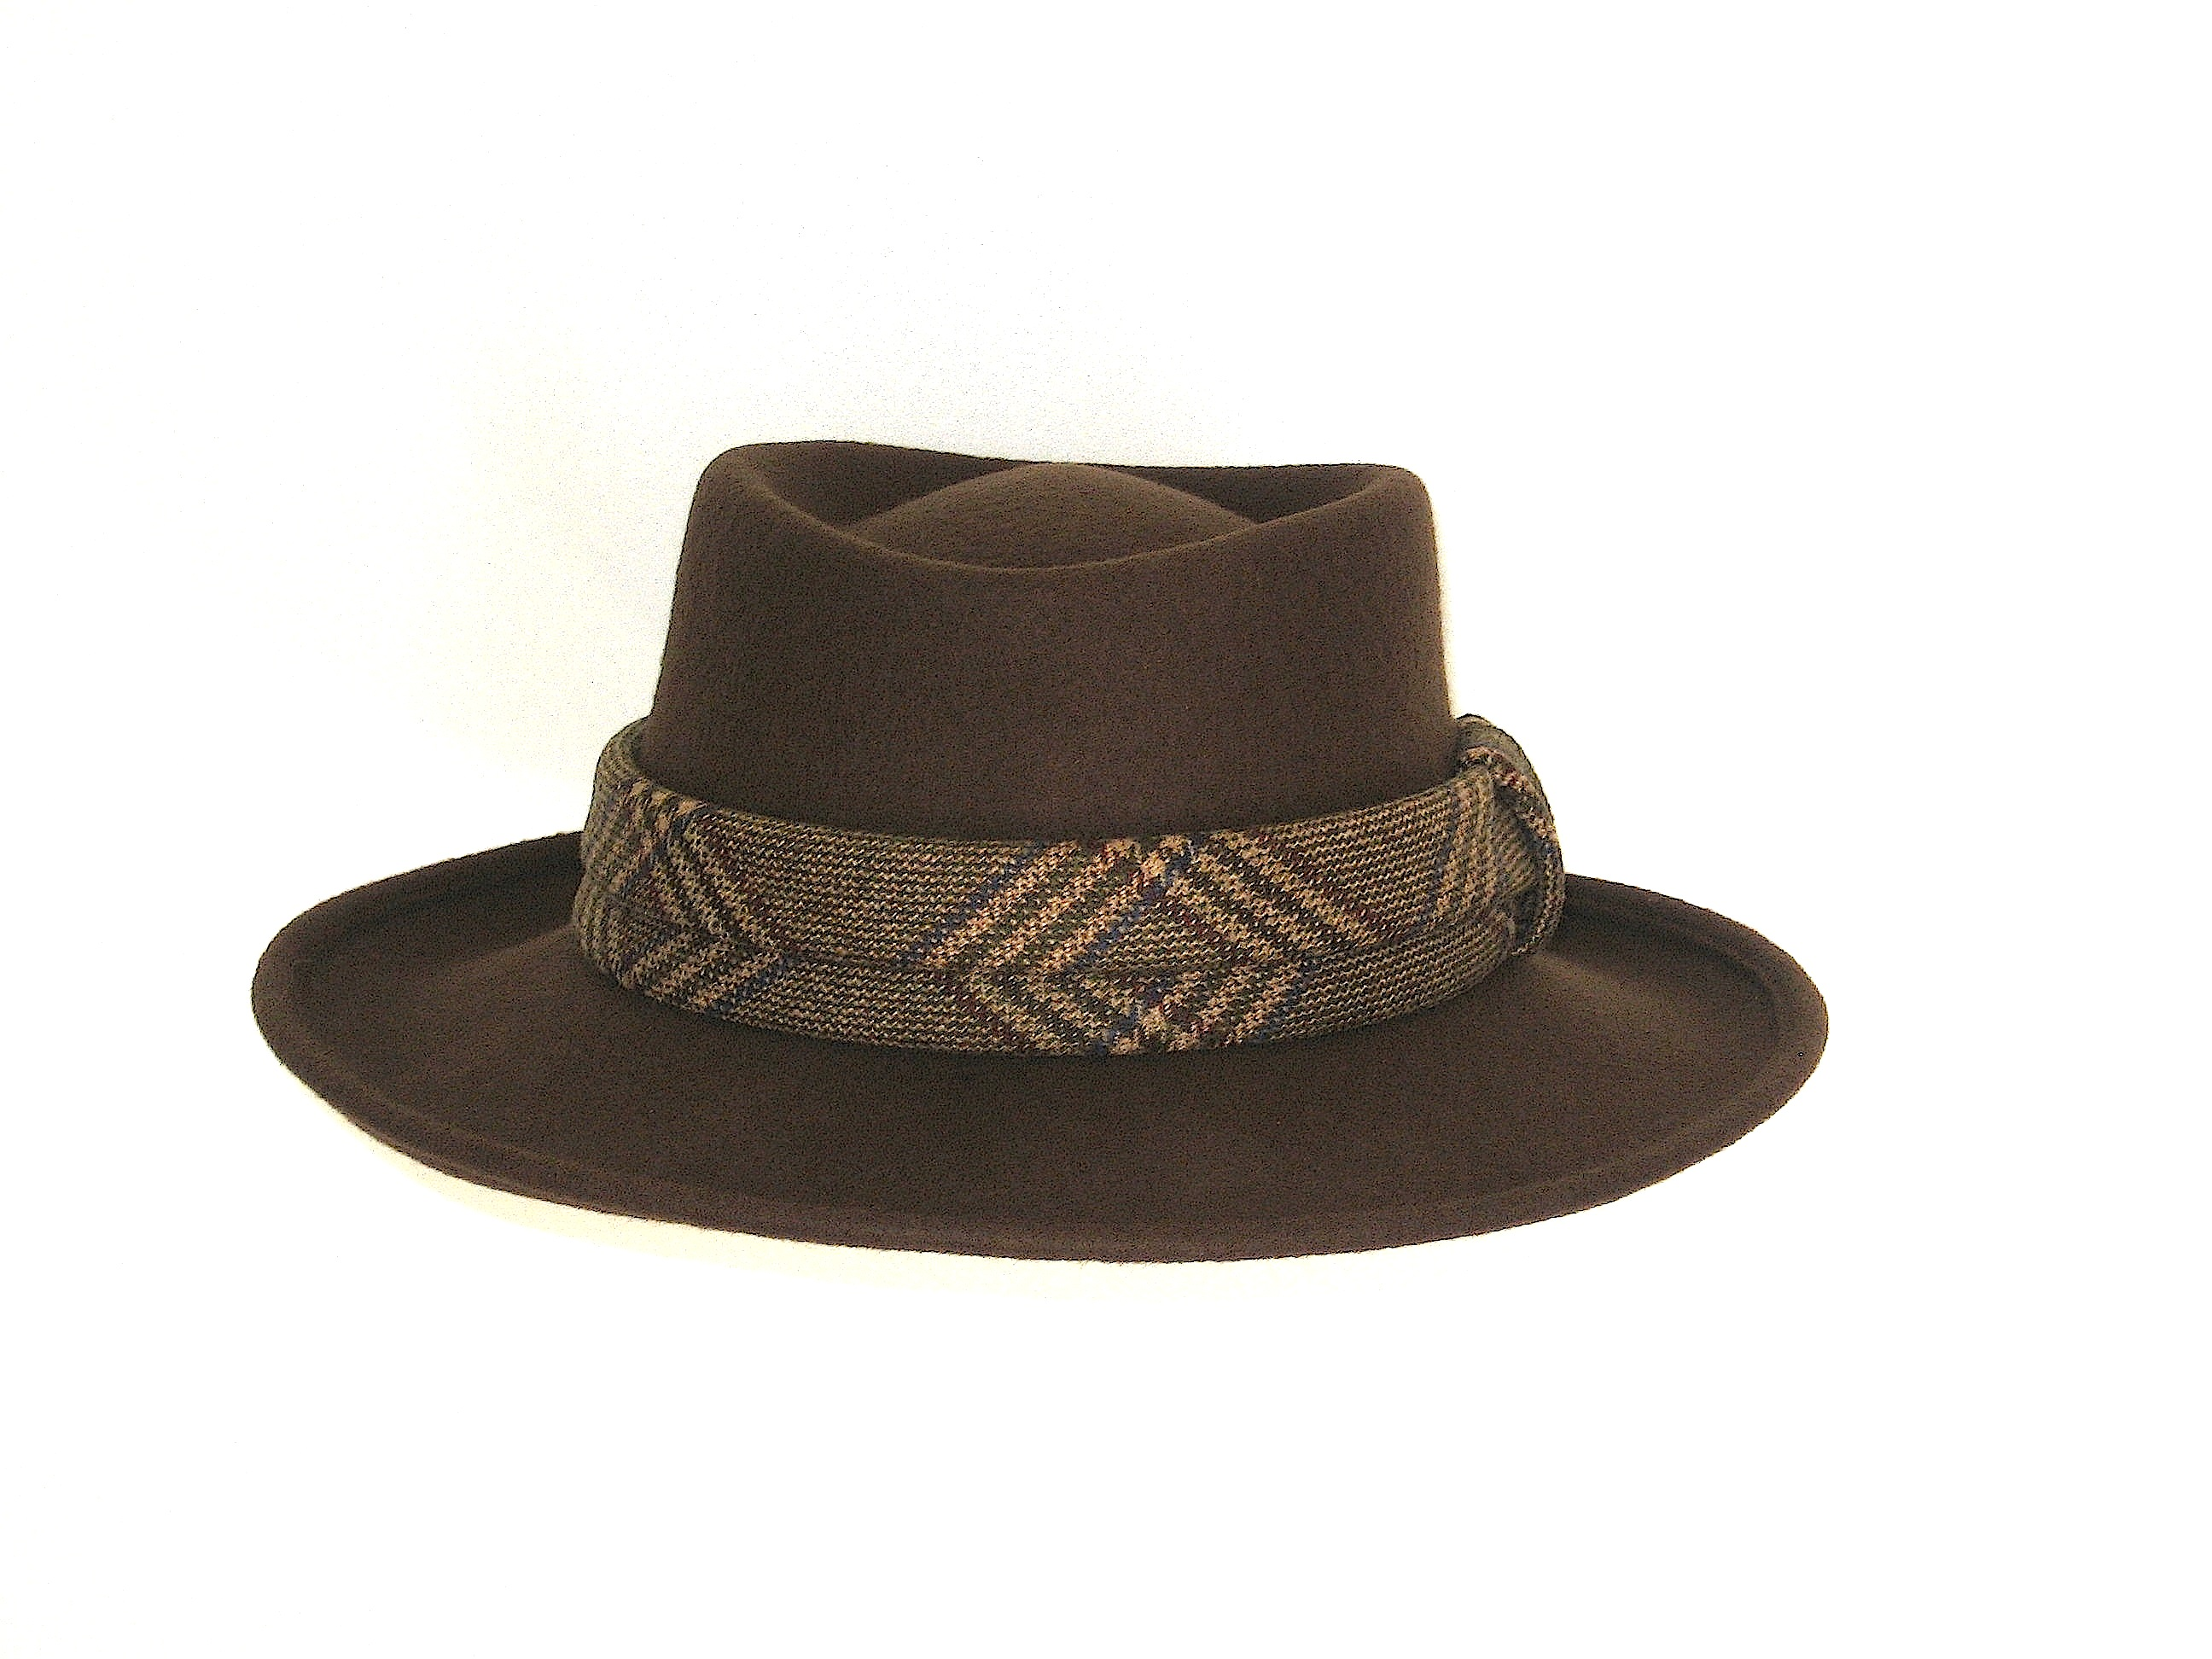 brown wool felt cowboy style hat races hats wedding hat